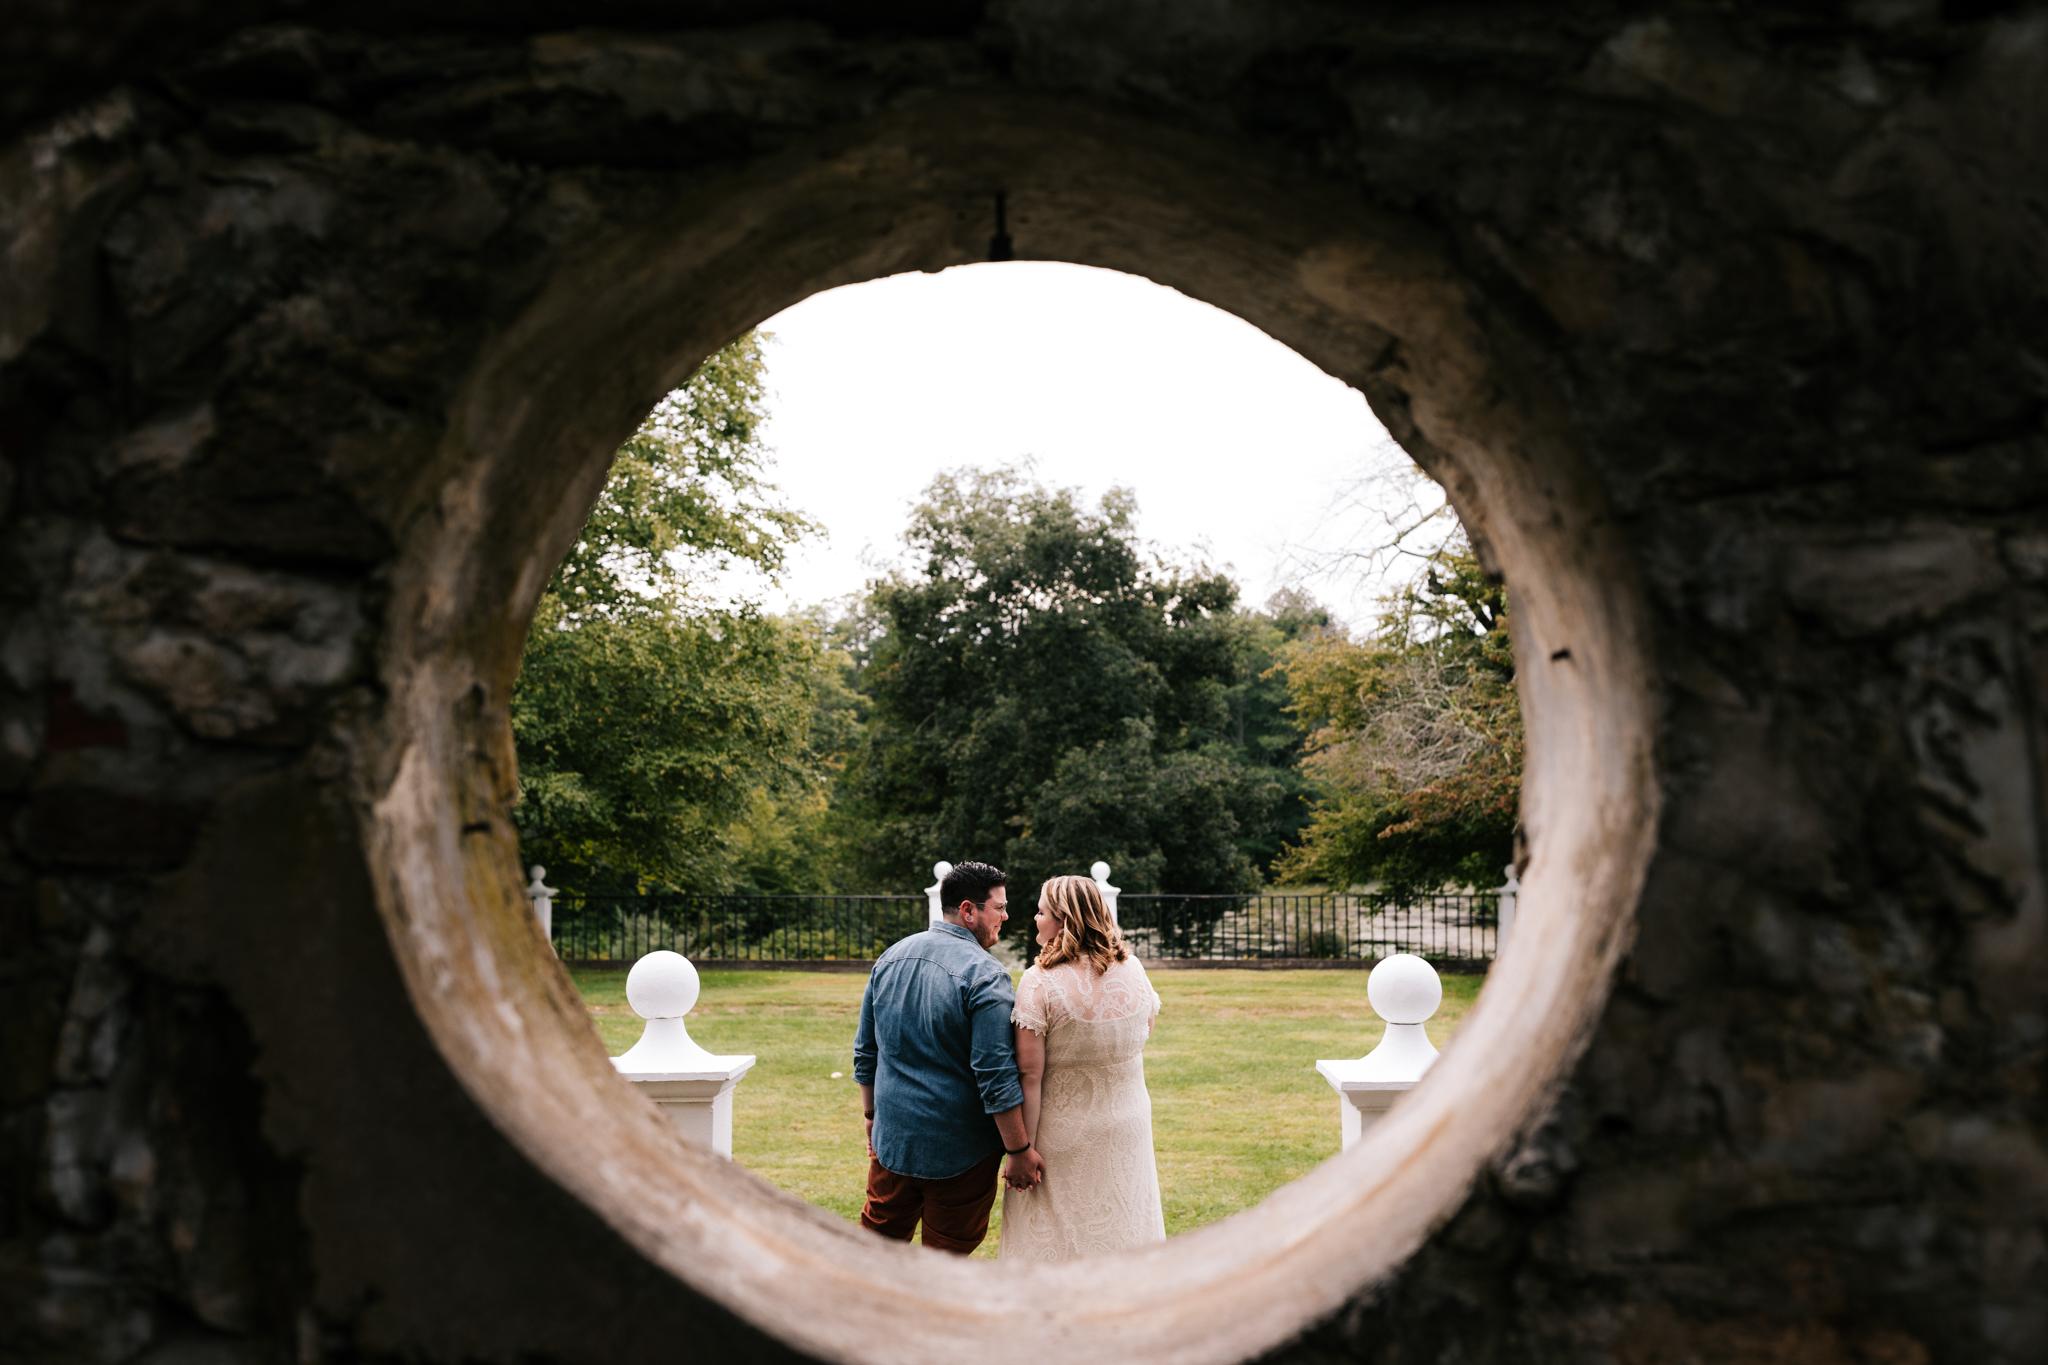 southwest-albuquerque-phoenix-engagement-photographer-gwyn-careg-inn-weddings-andrea-van-orsouw-photography-4.jpg